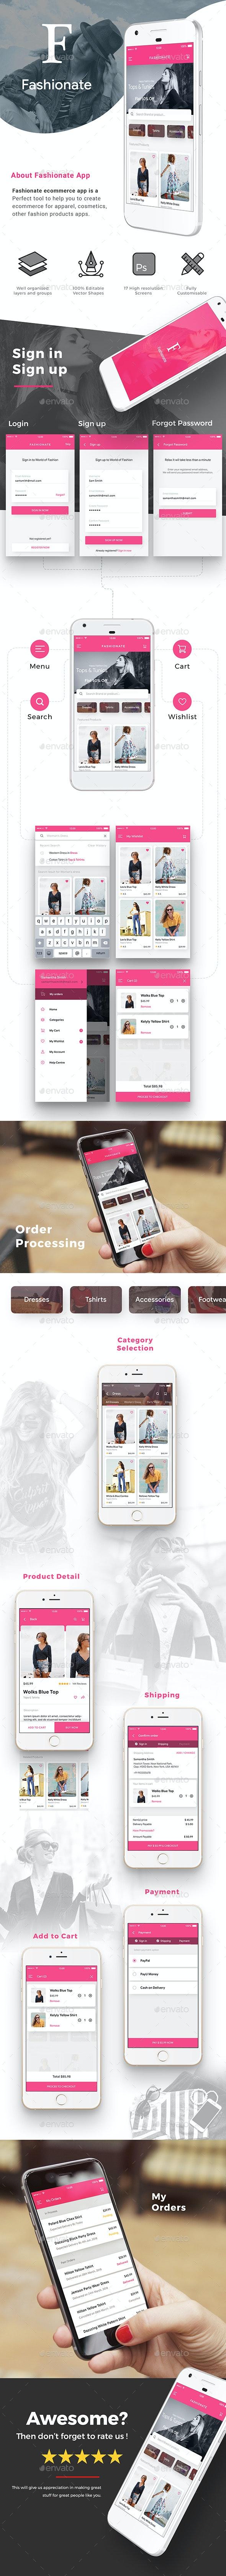 E commerce Fashion App UI Set | Fashionate - User Interfaces Web Elements